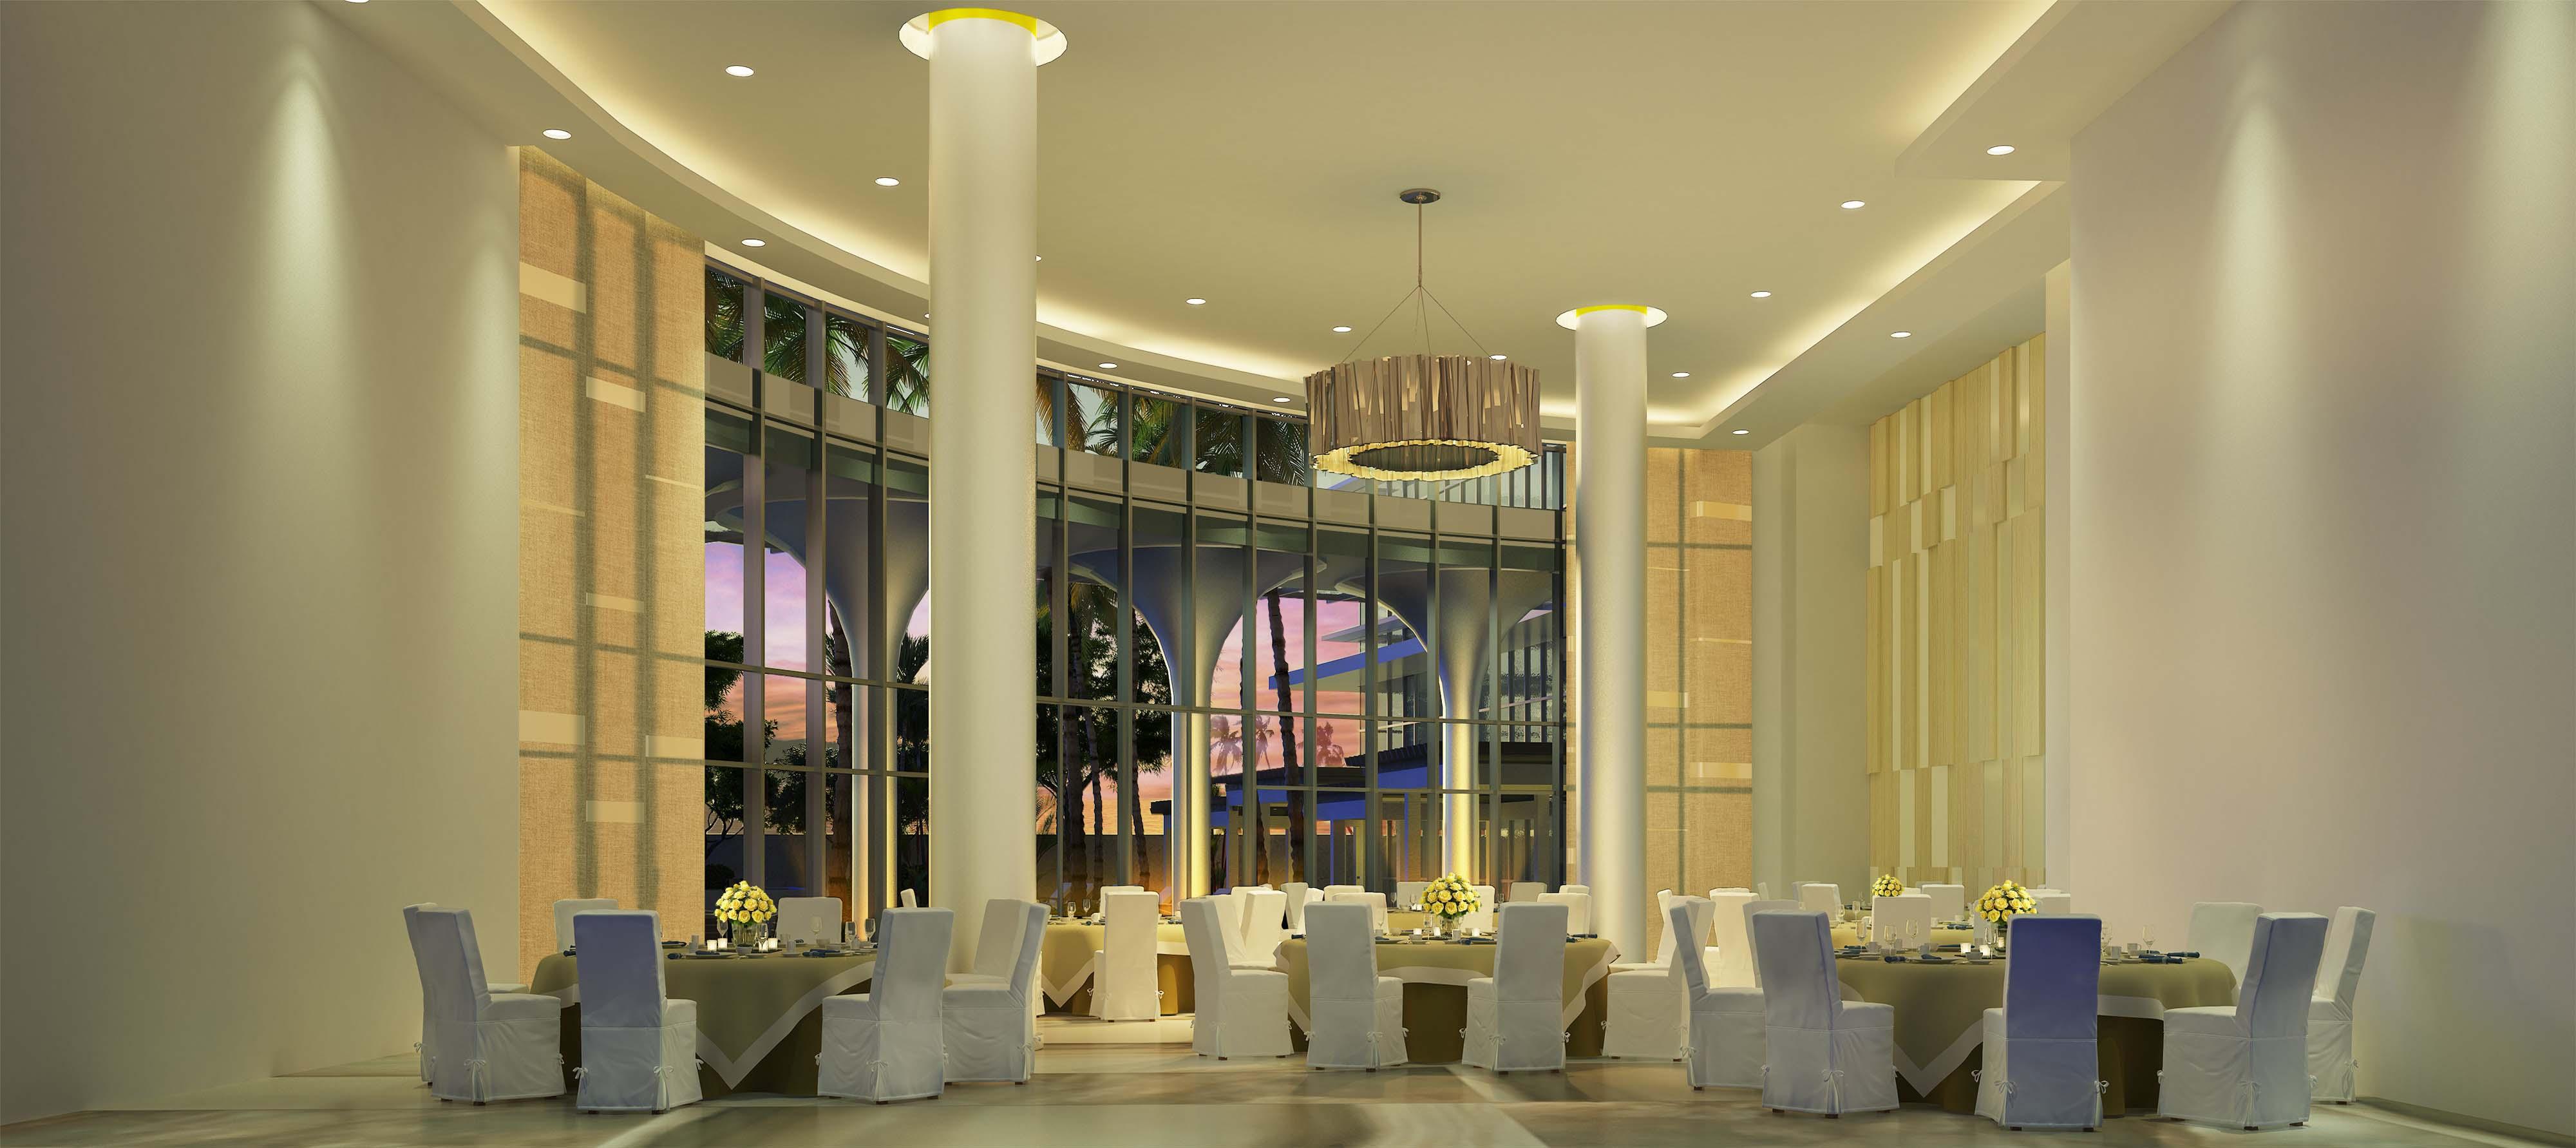 uptown-parksuites-bgc-global-city-condos-for-sale-multipurpose